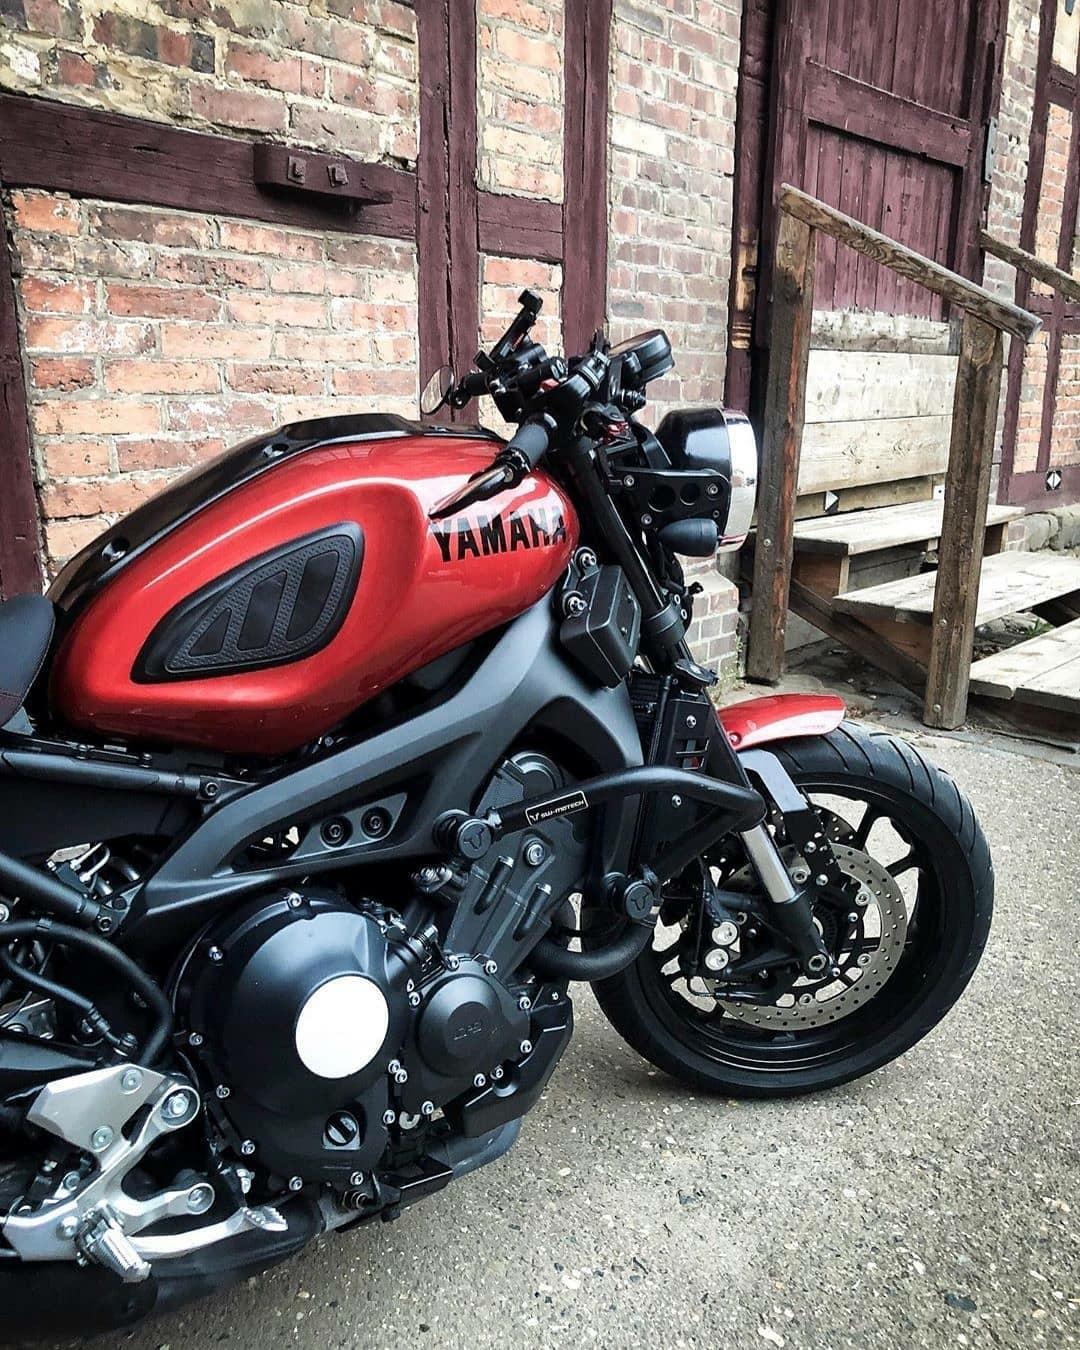 red yamaha motorcycle